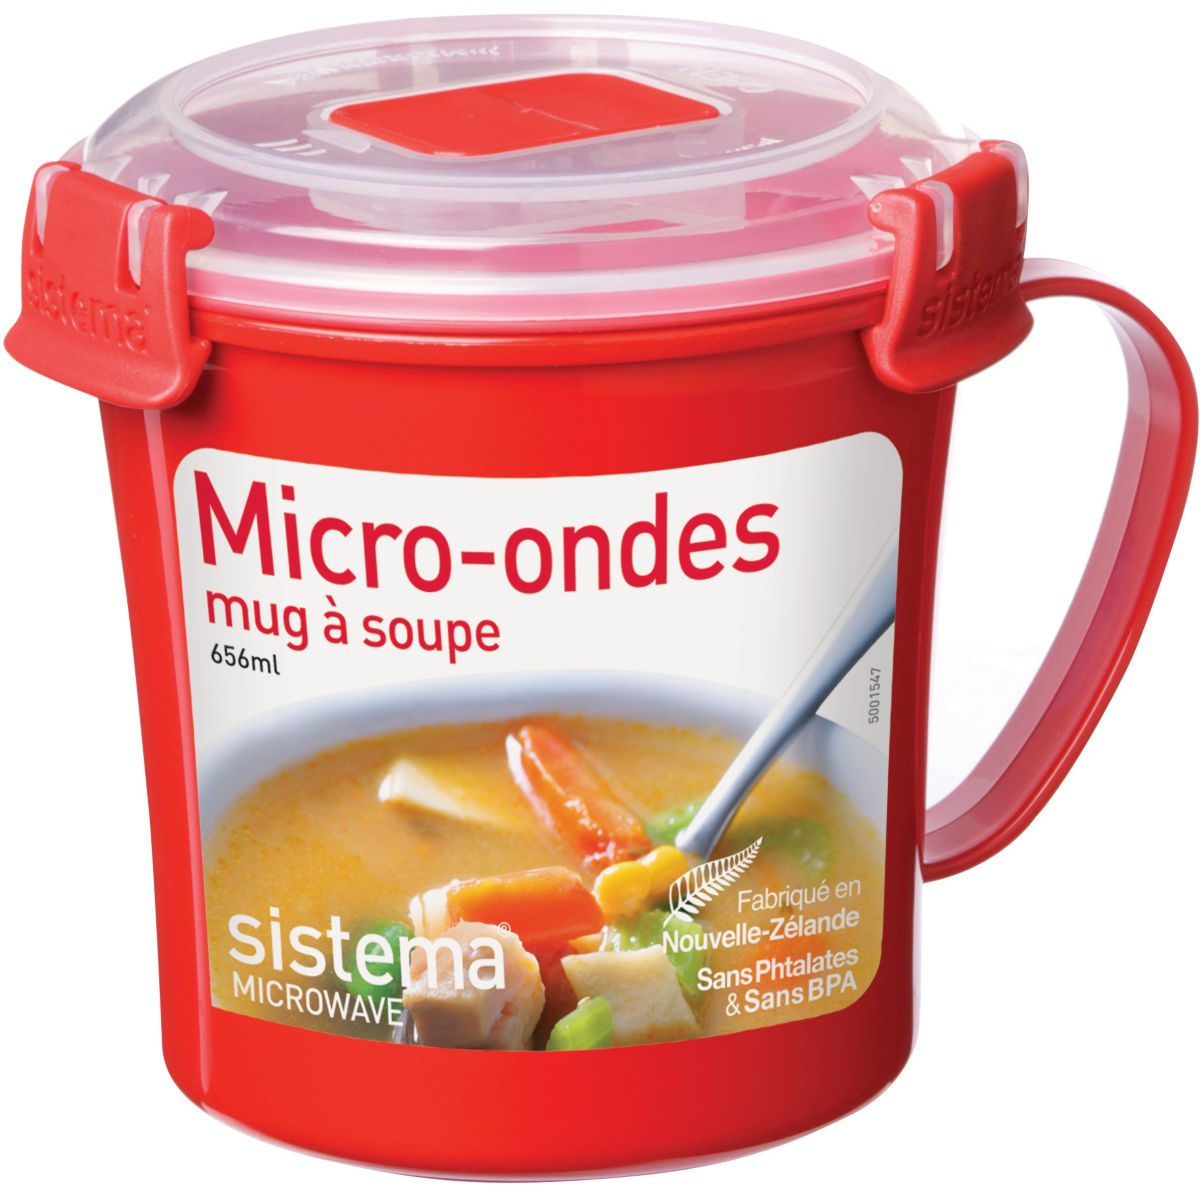 Mug SISTEMA soupe micro-ondes à clips 656 ml (photo)